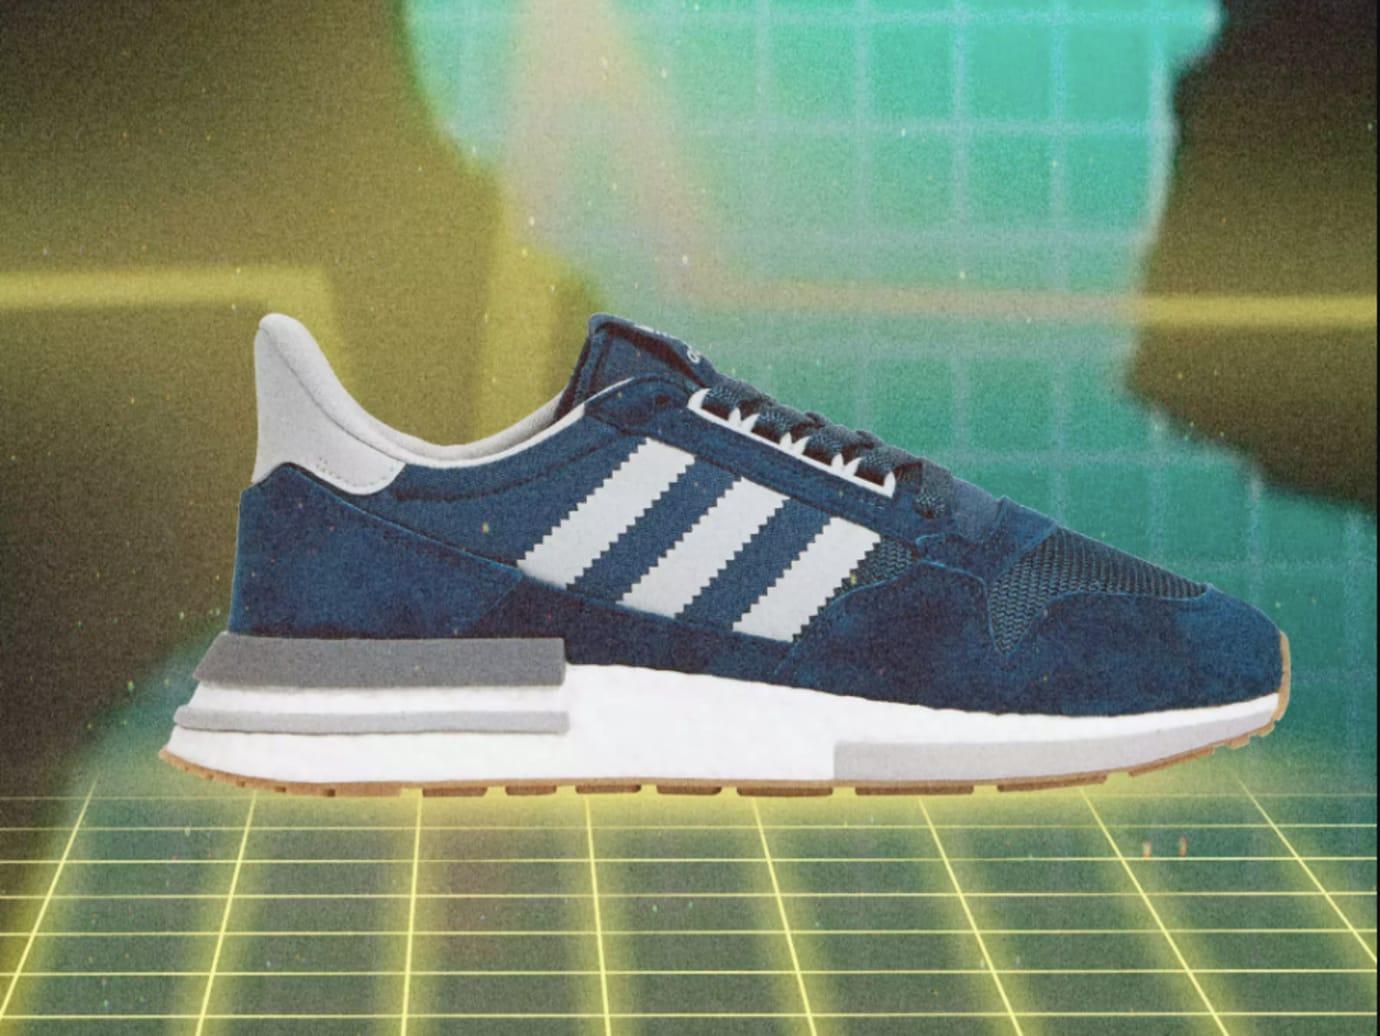 cd1dd68a3f331 Sneakersnstuff x Adidas Originals ZX 500 RM F36882 Release Date